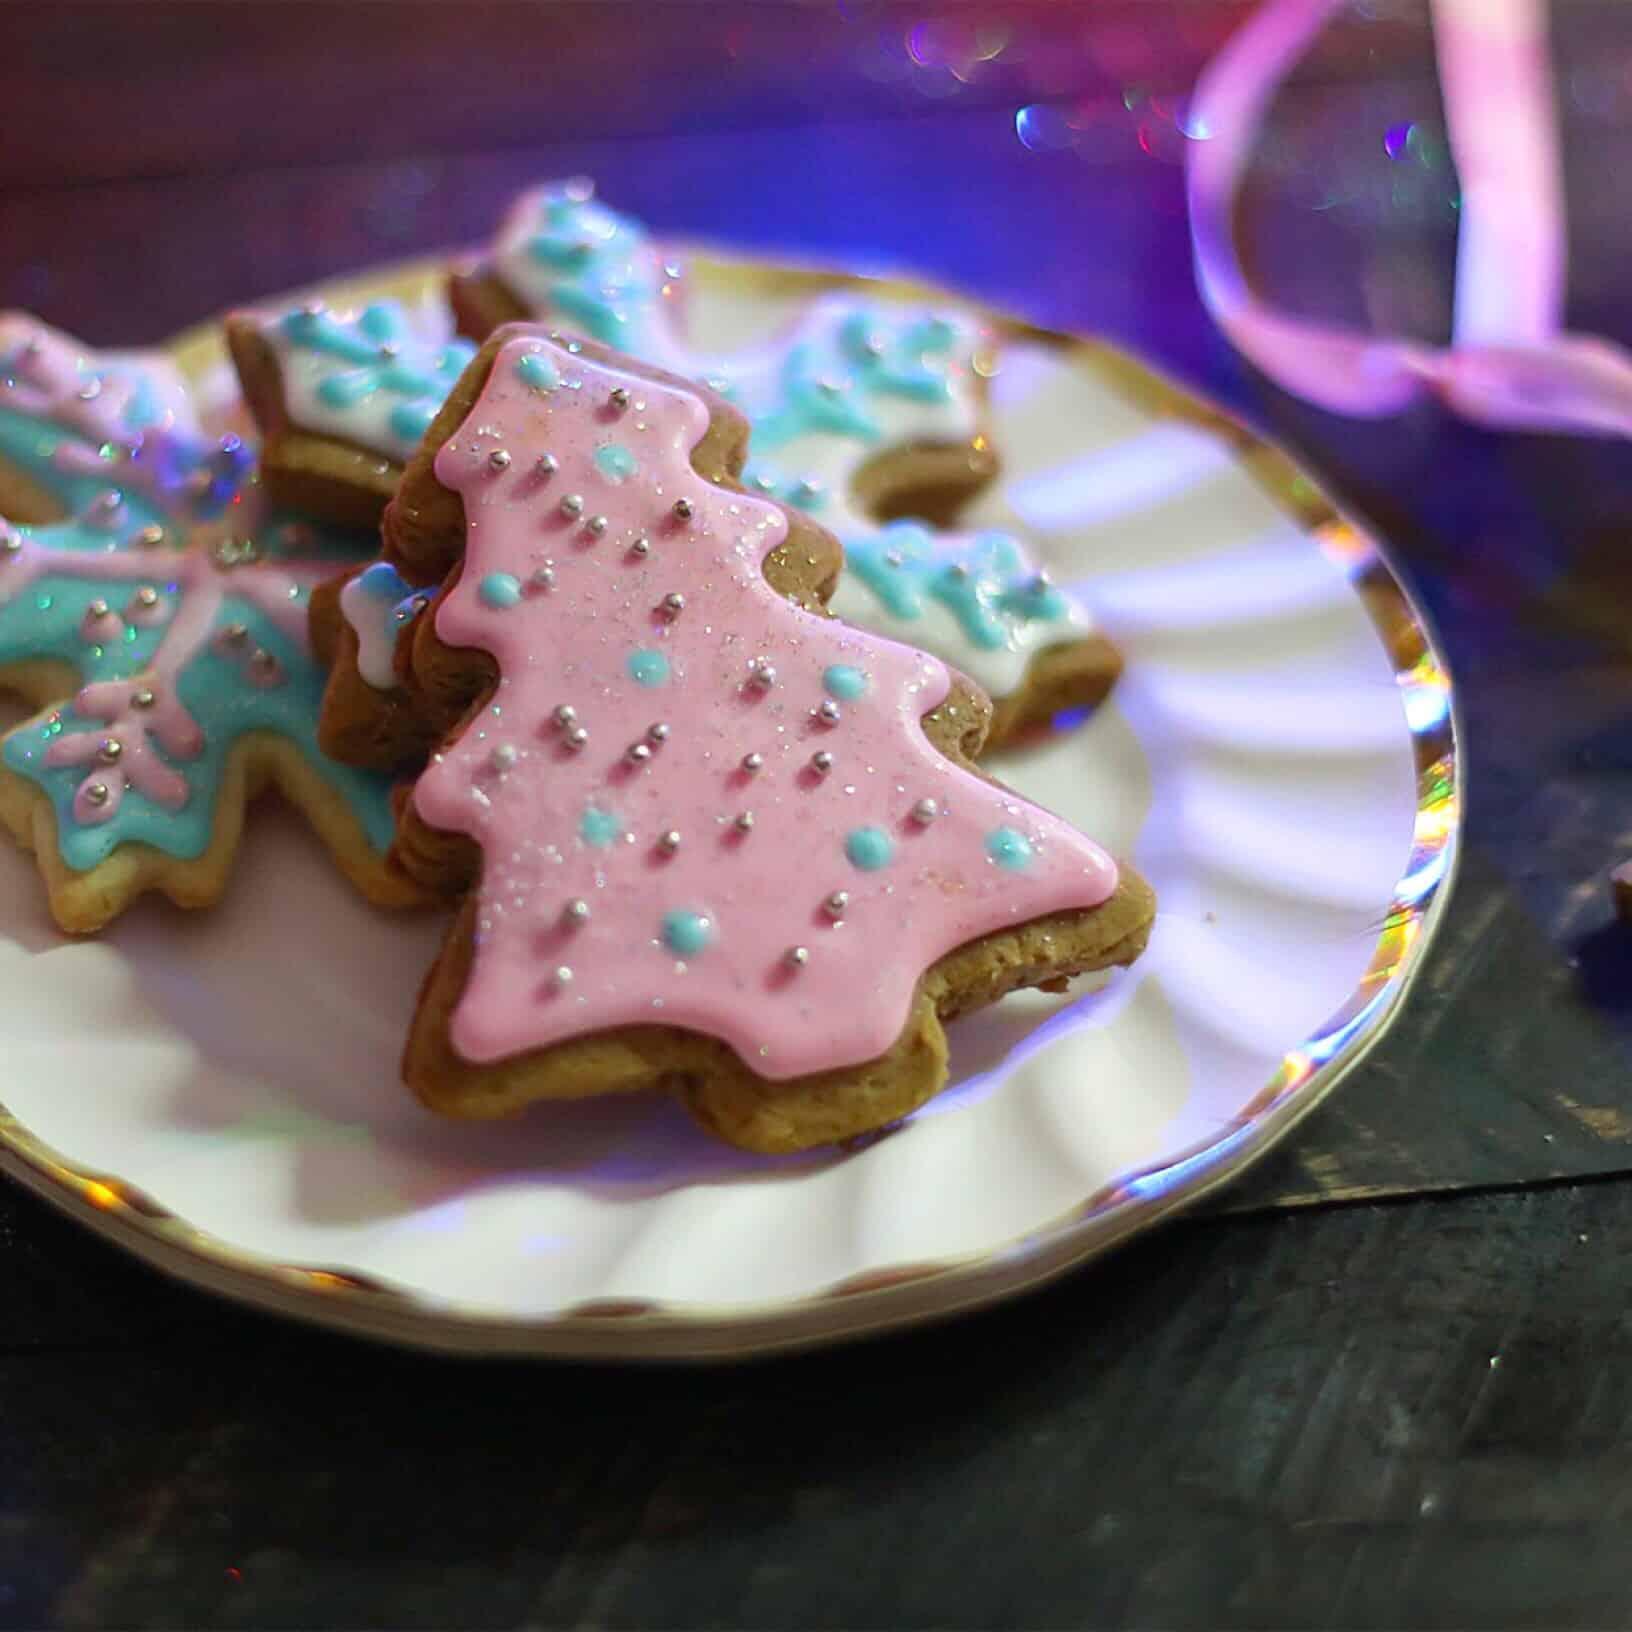 GF Gingerbread